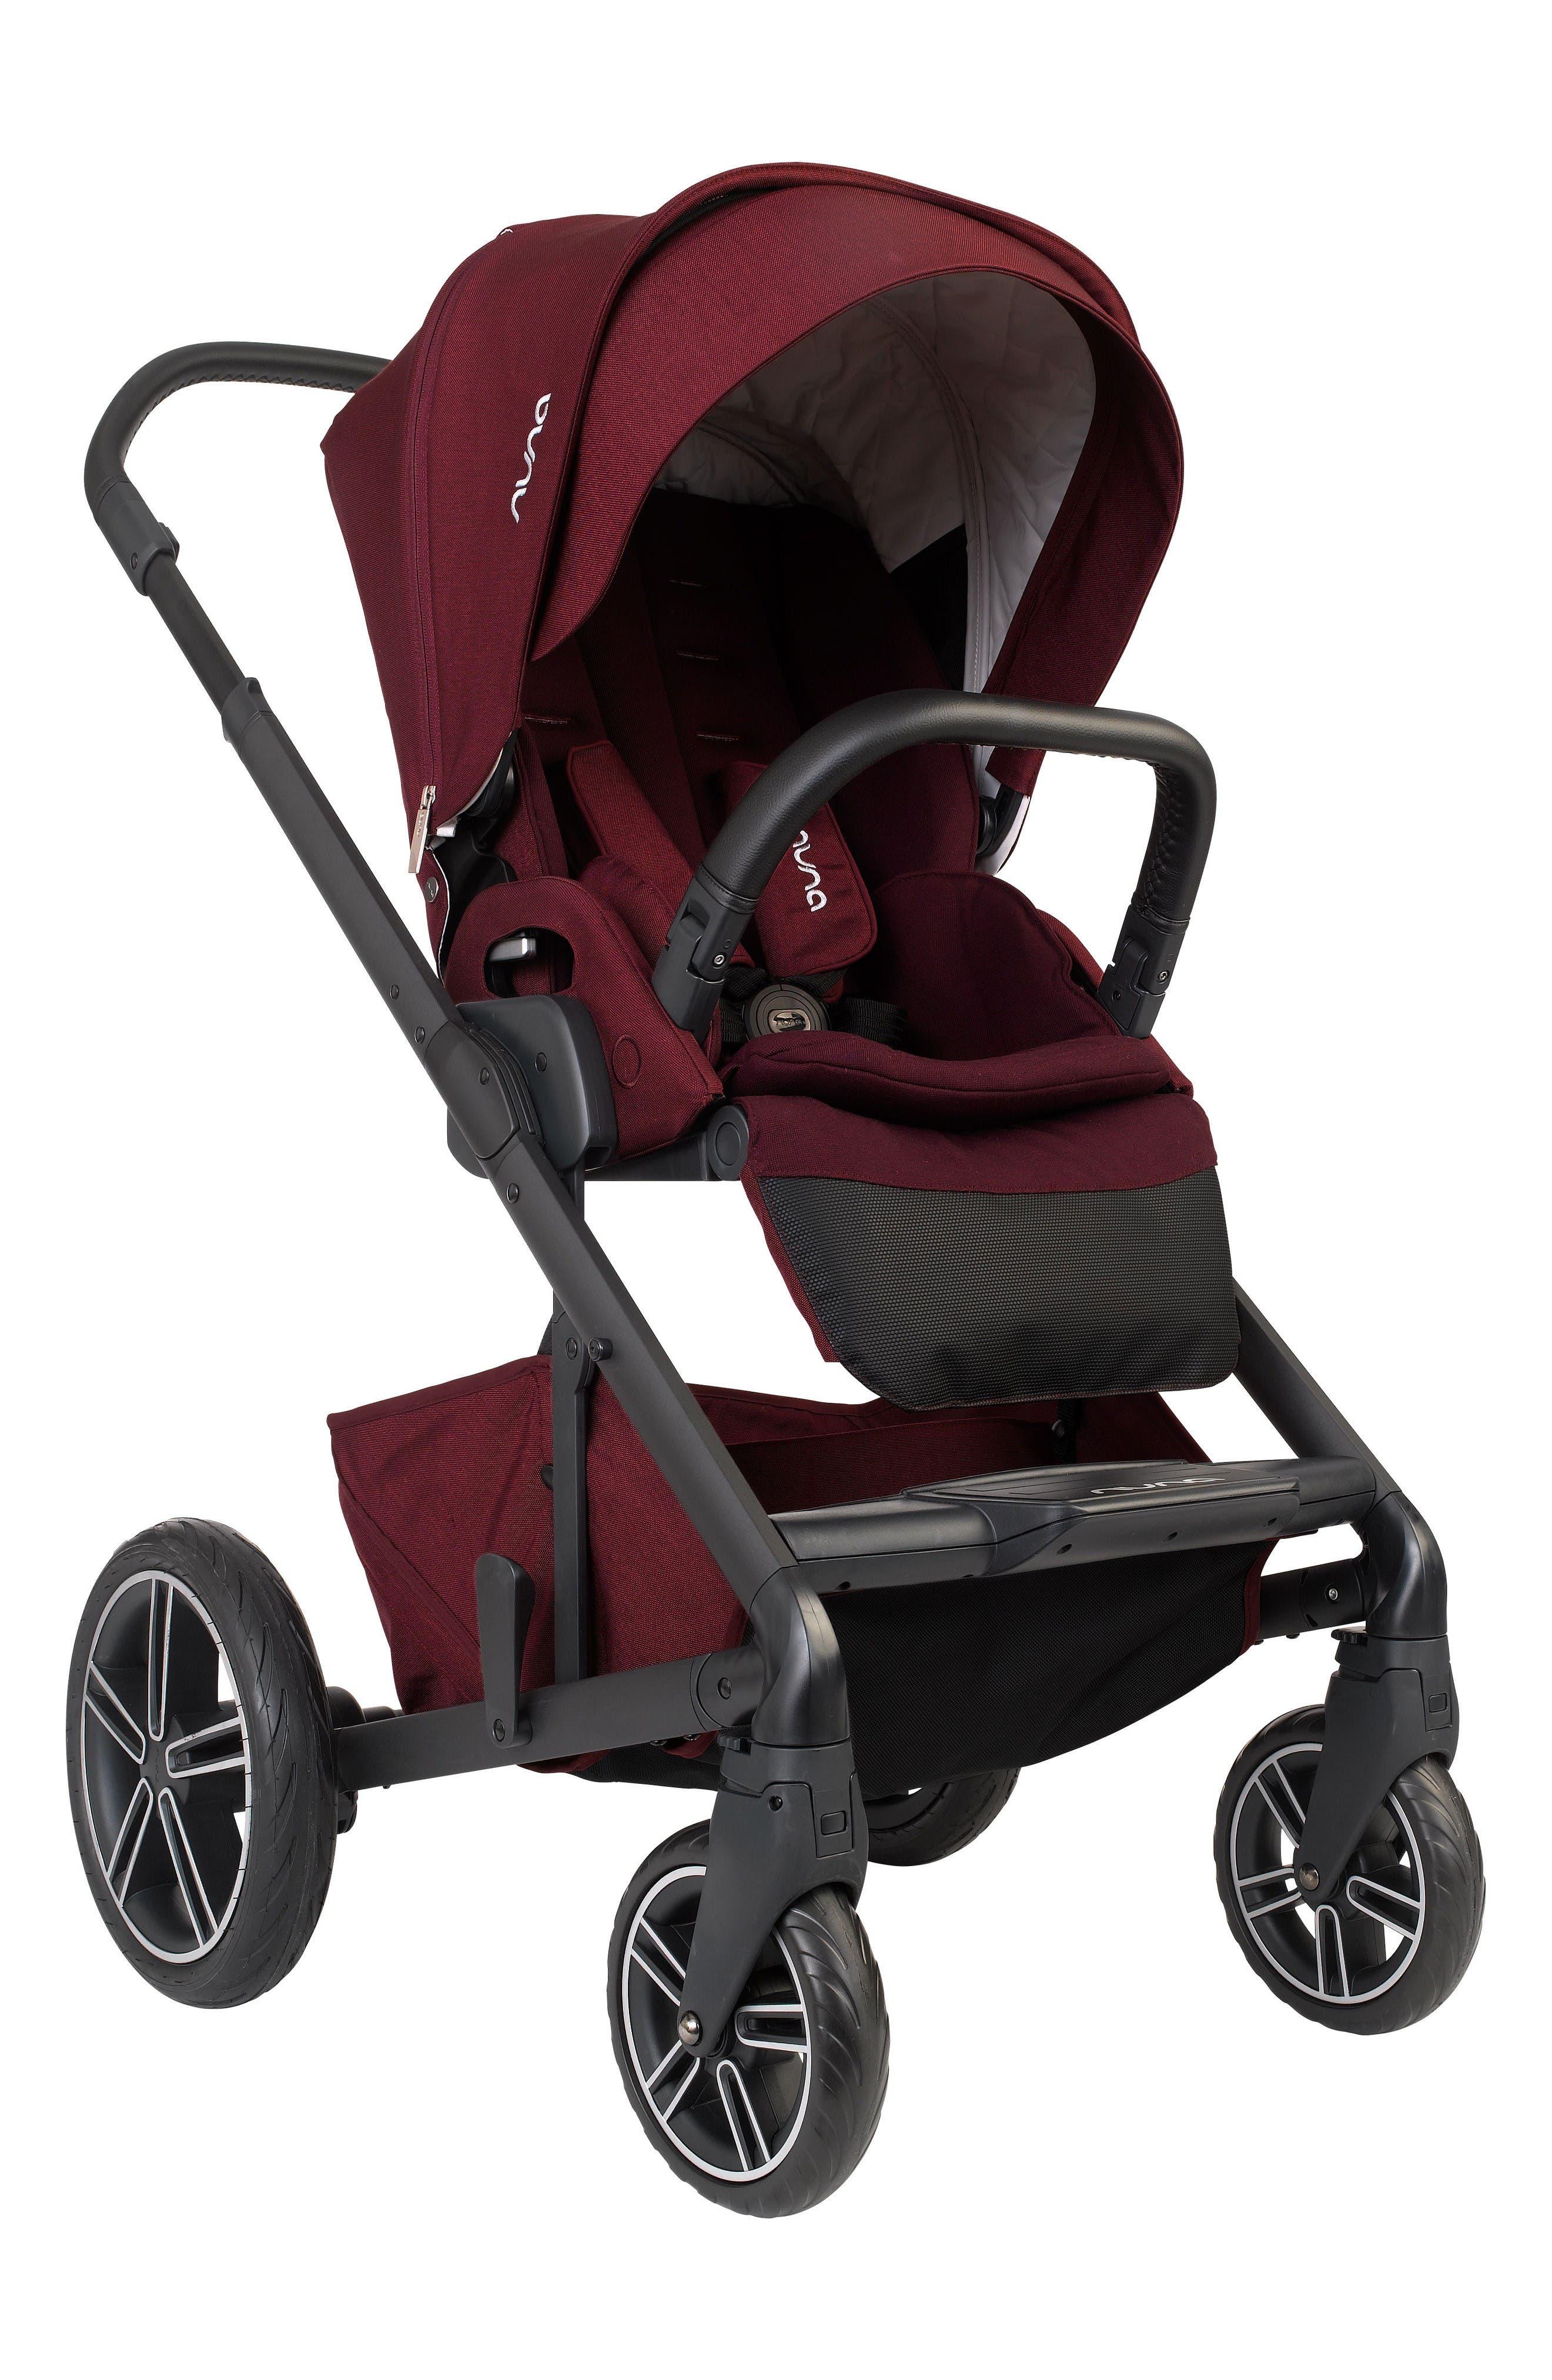 nuna MIXX2™ Three Mode Stroller with All Terrain Tires